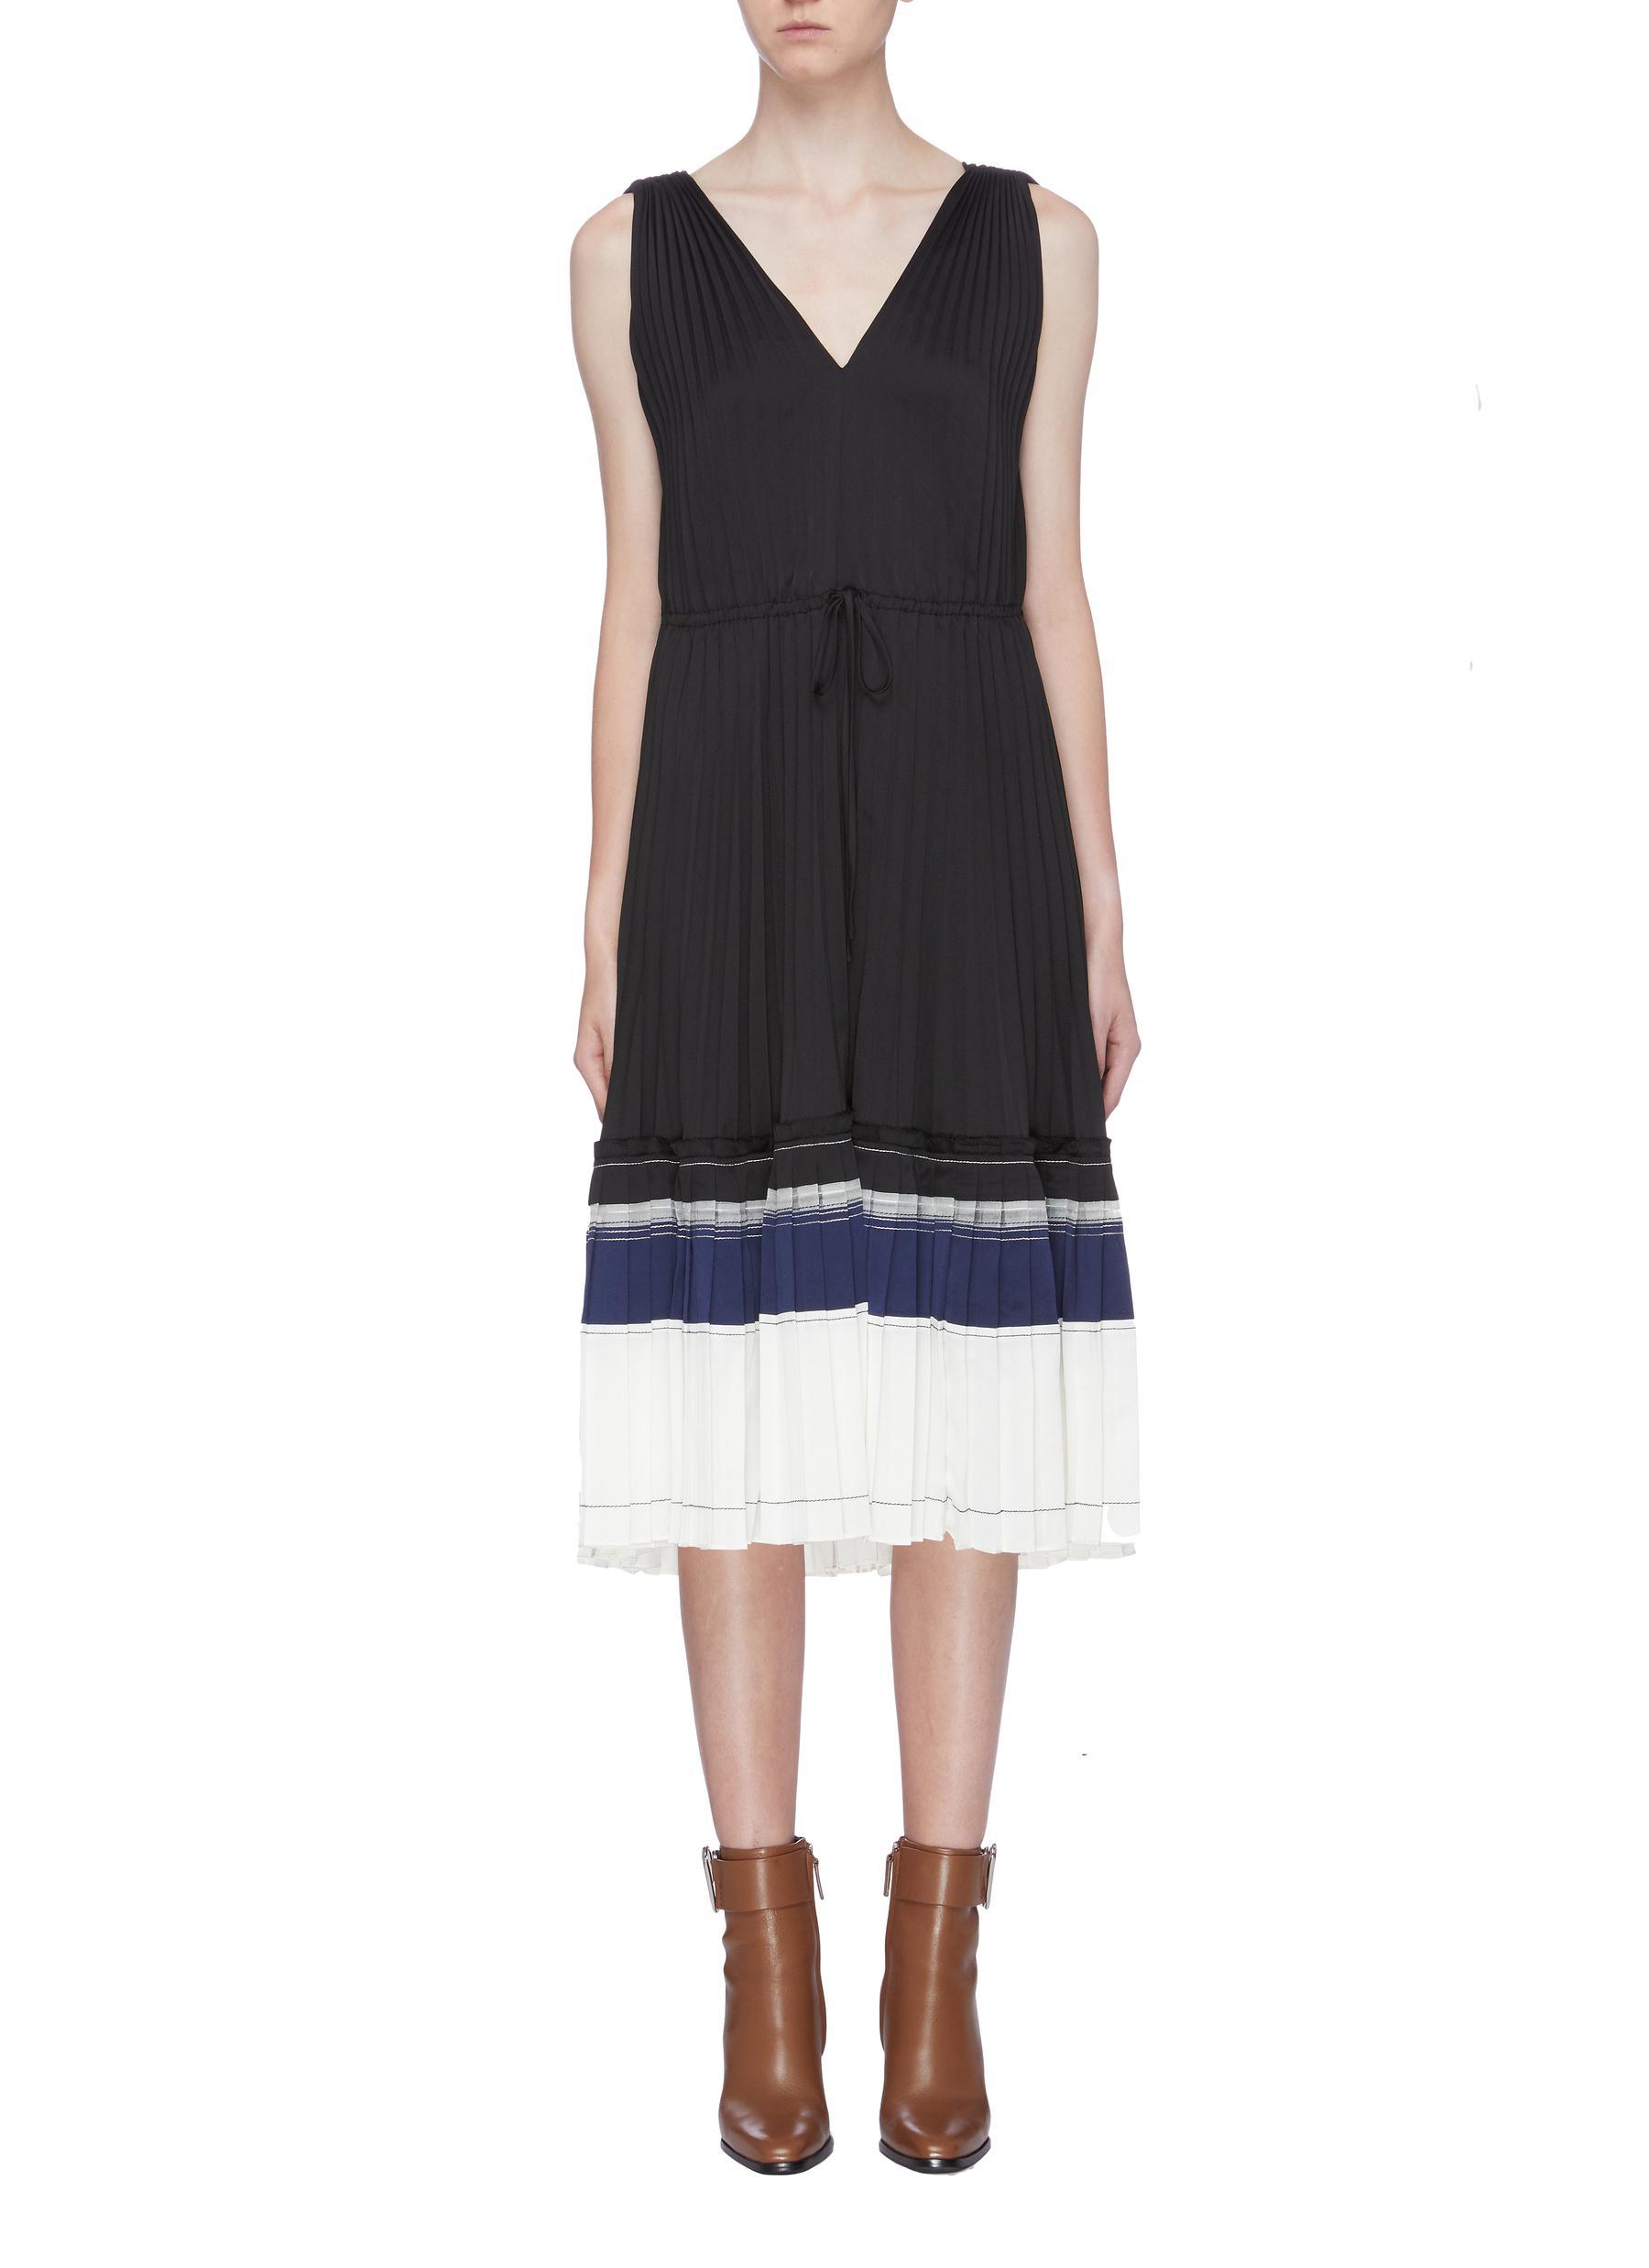 Tiered stripe hem pleated dress by 3.1 Phillip Lim